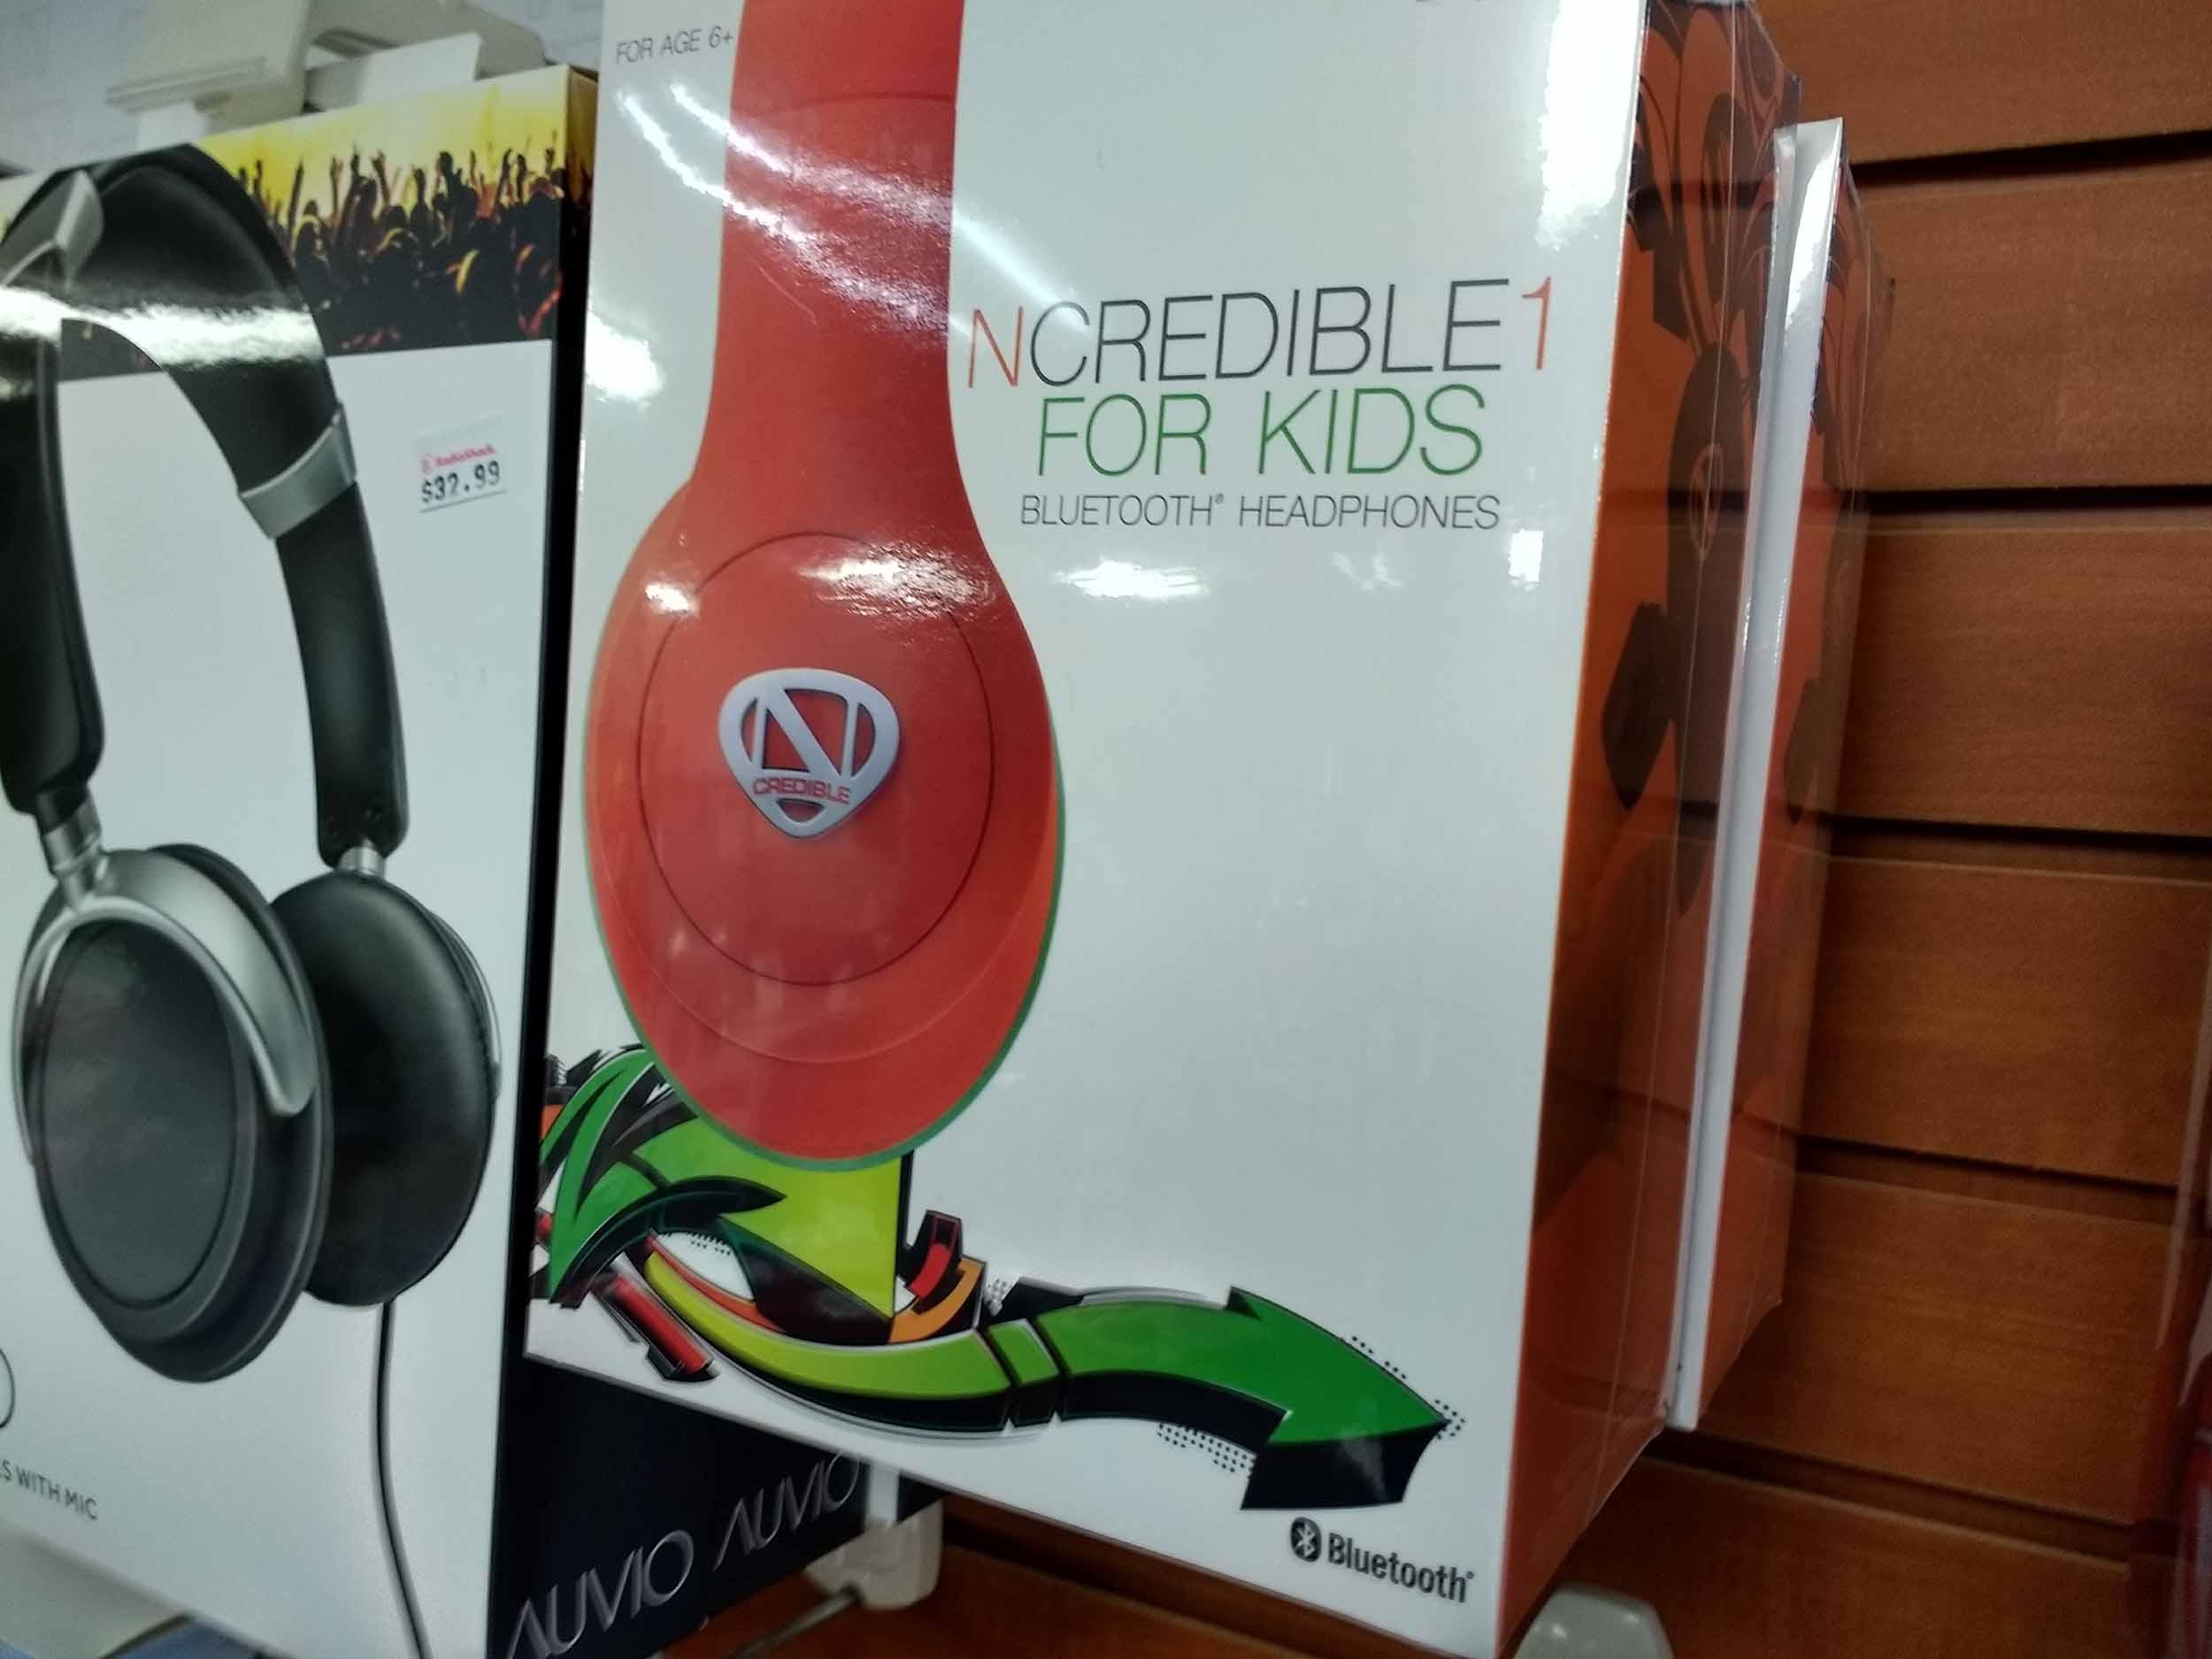 Incredible1 Bluetooth headphones for kids.